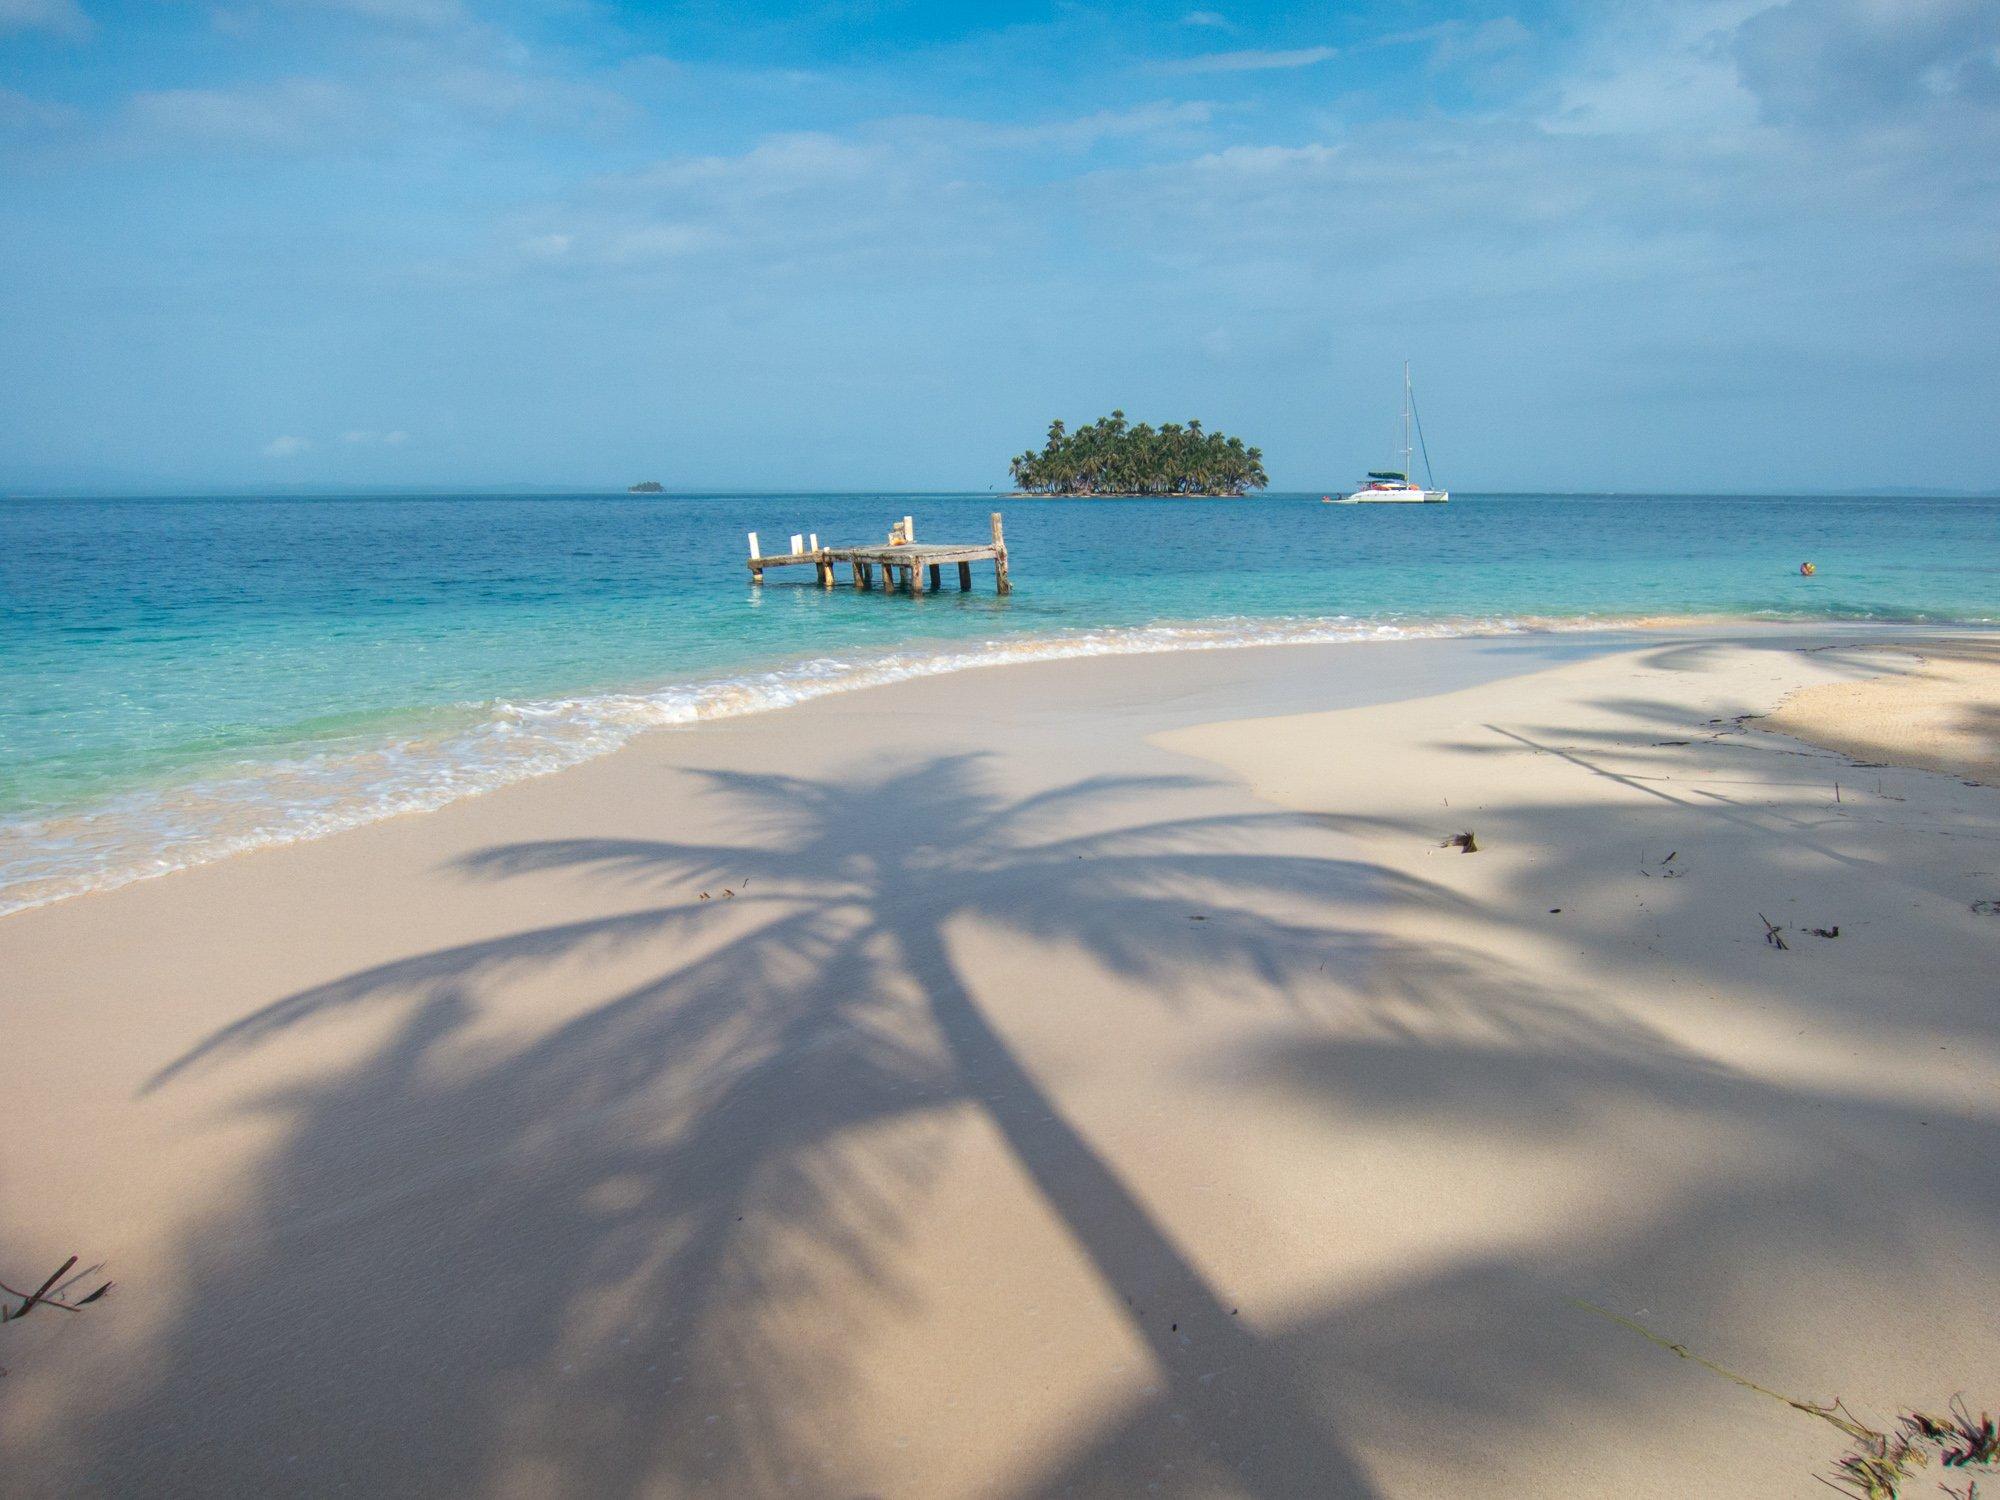 Kuanidup beach